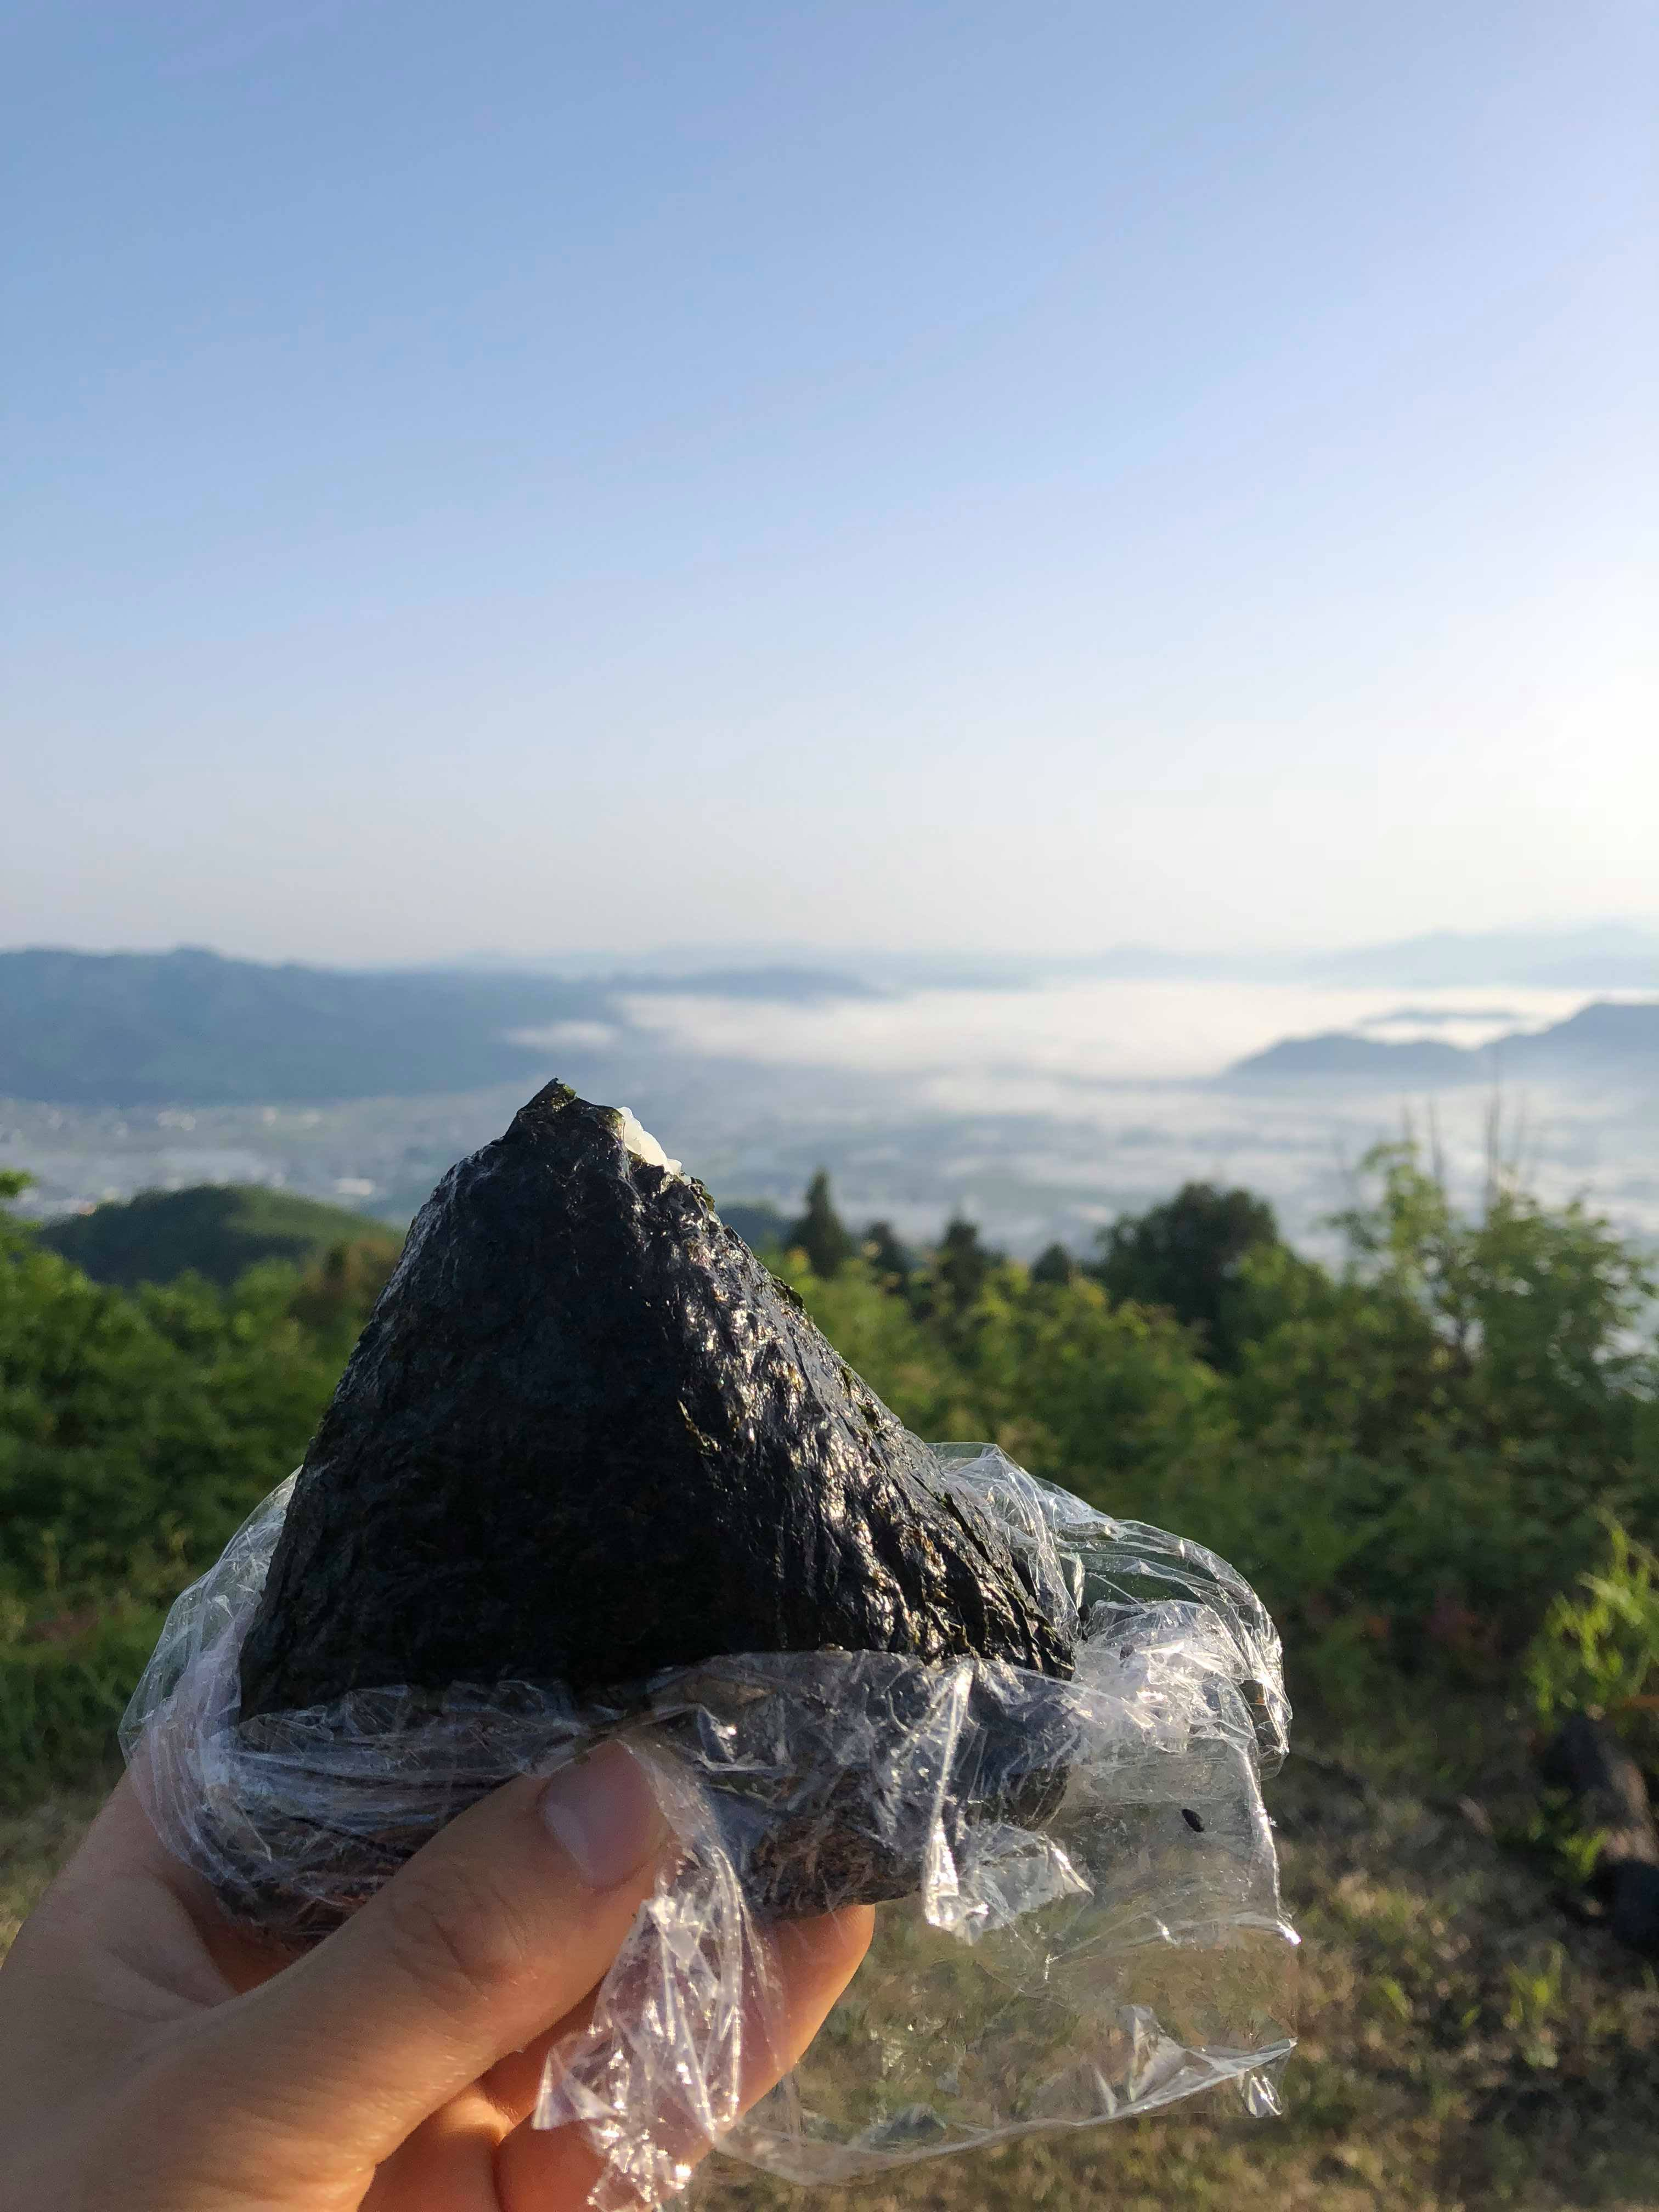 2018.5.15 tue. KYUN & SHISHIMAI 登山日記